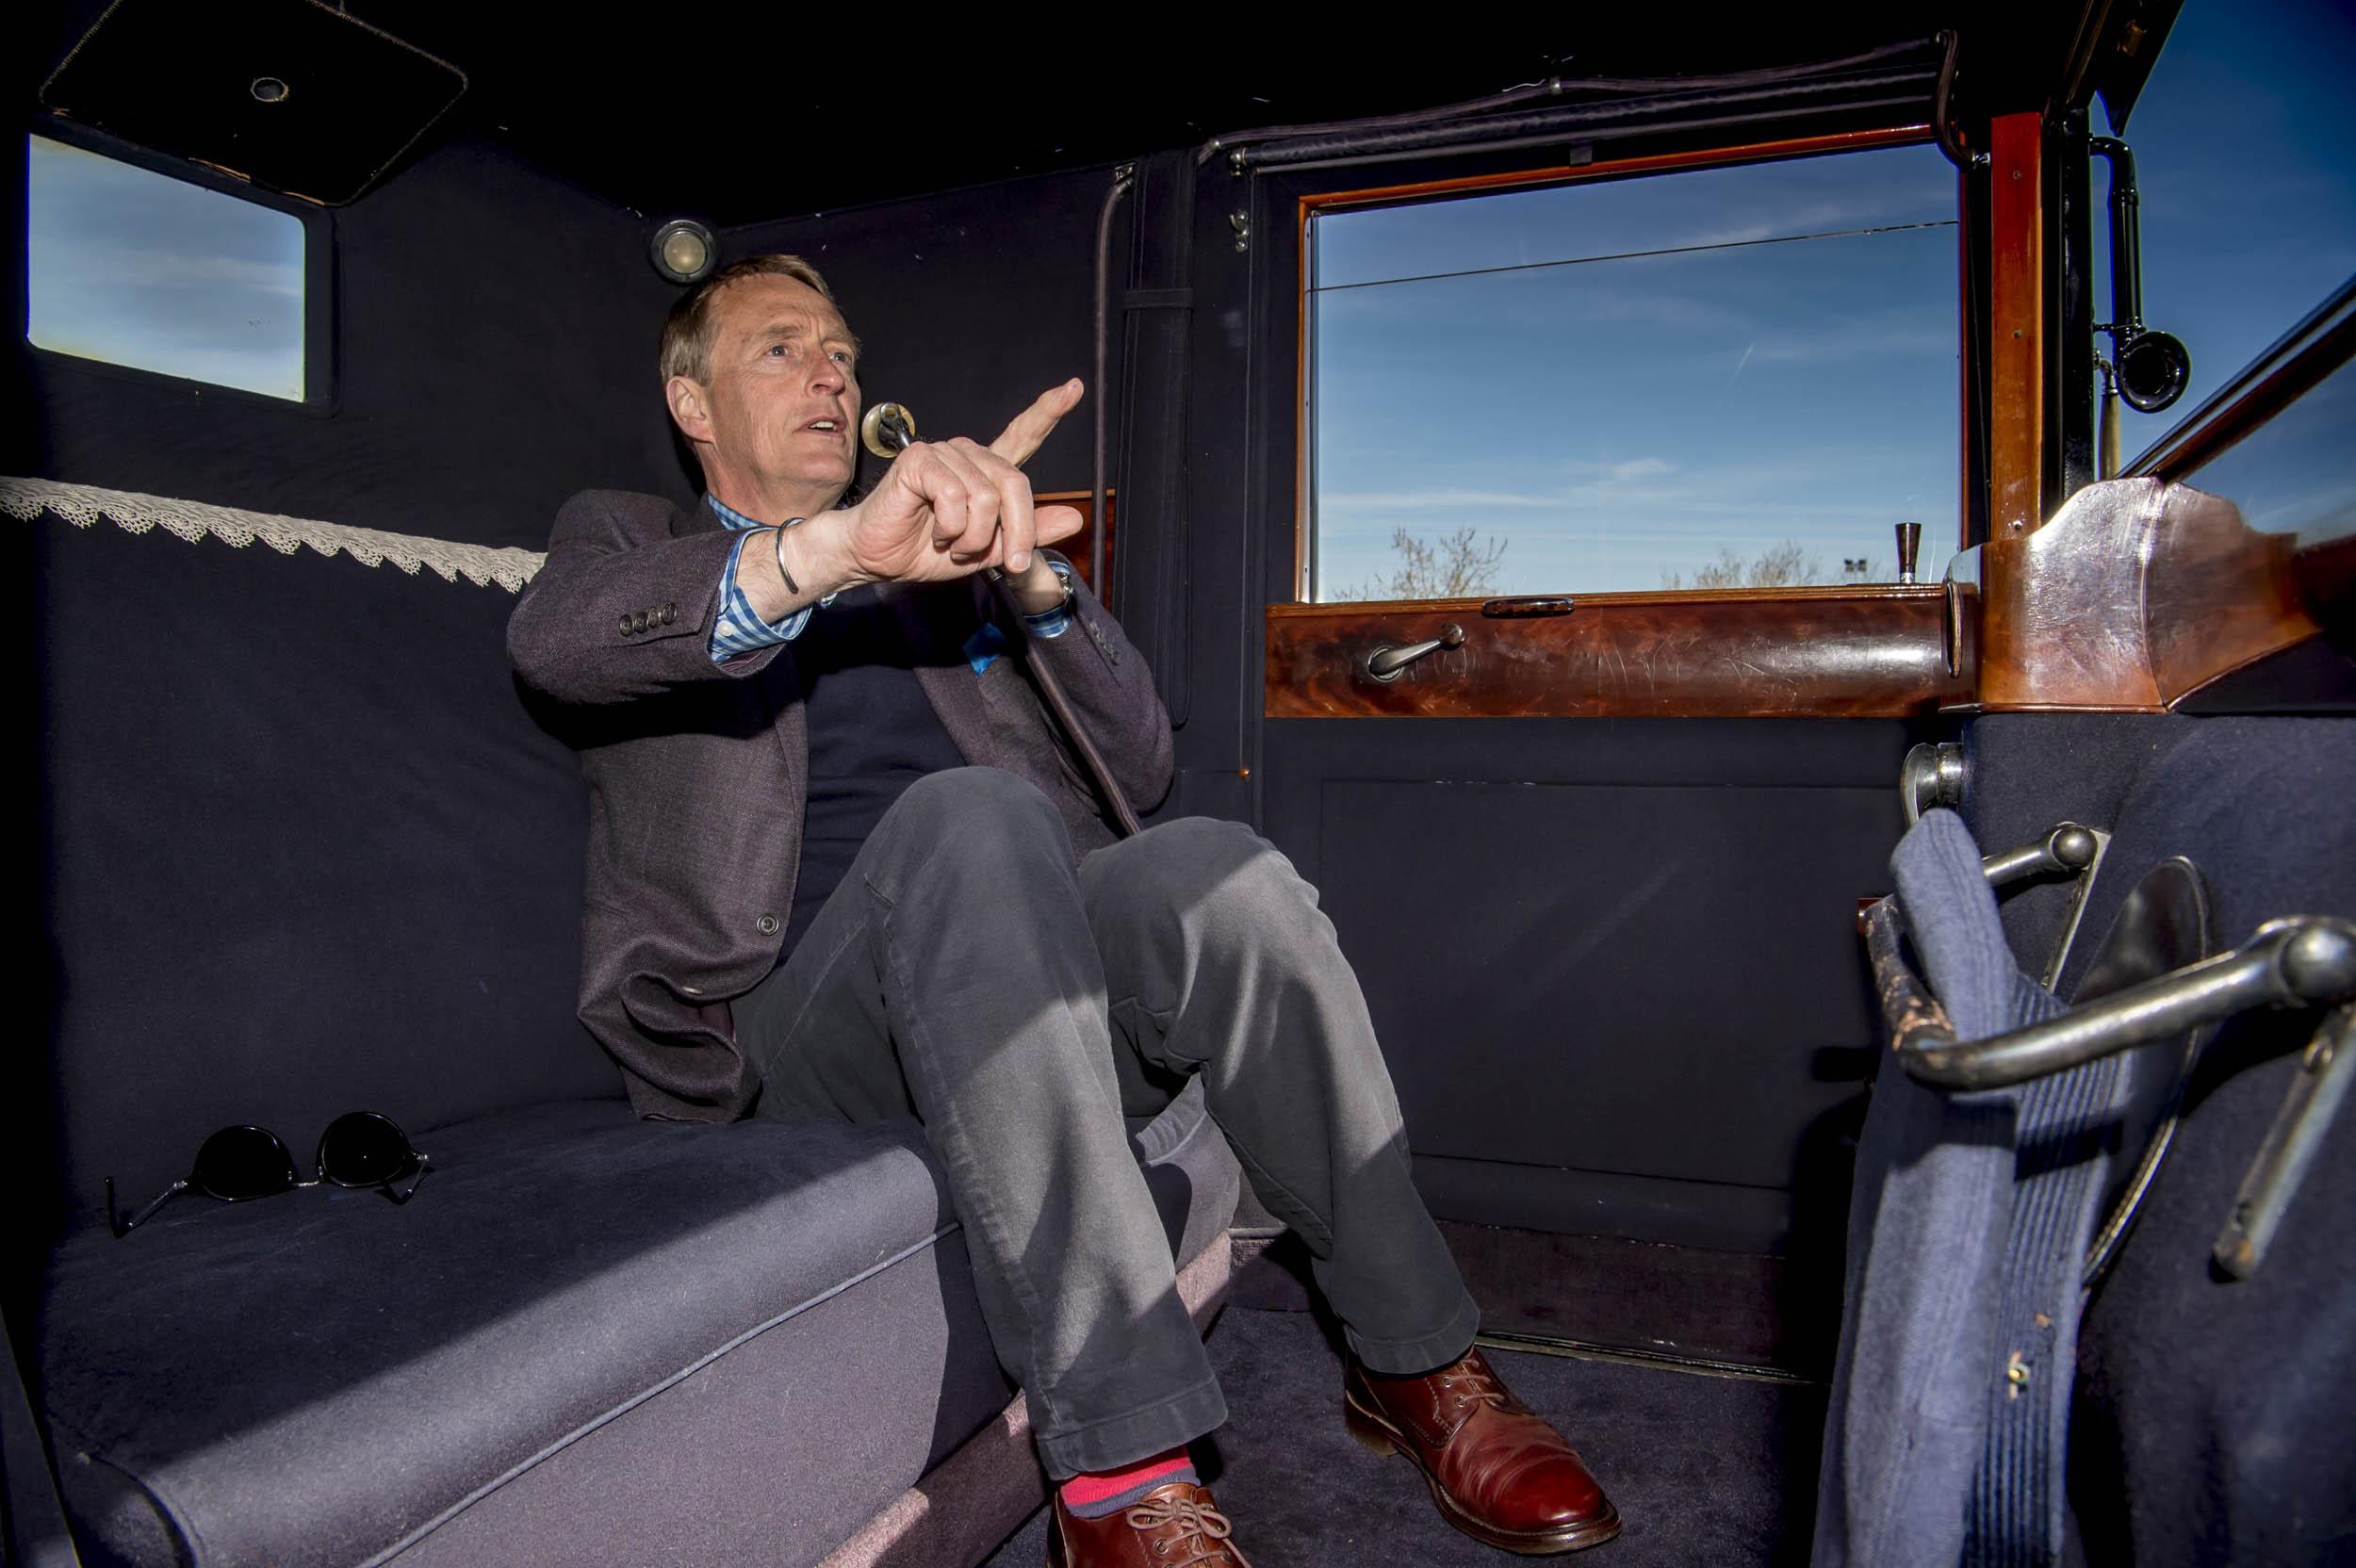 renault coupe de ville passenger and interior